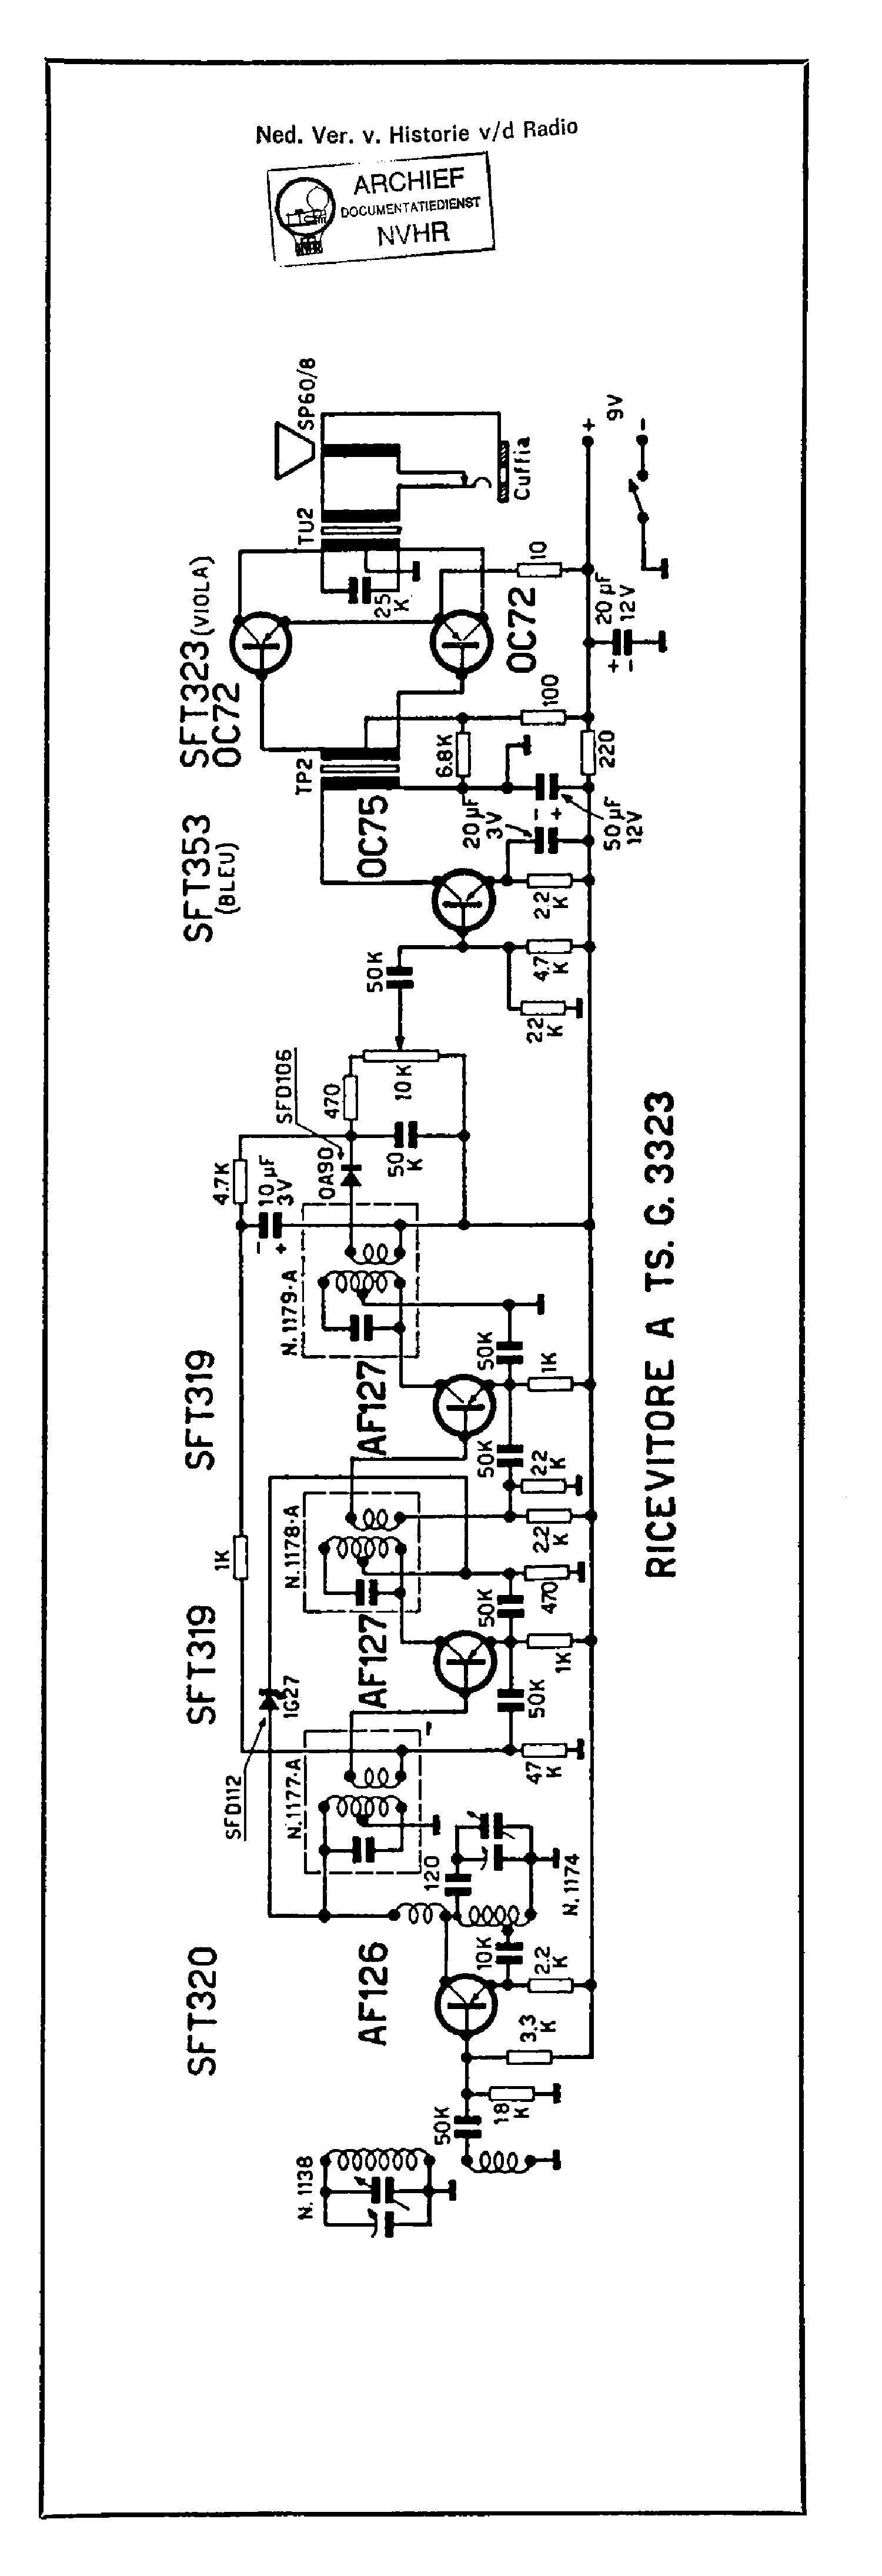 geloso g3323 9v transistor receiver sch service manual